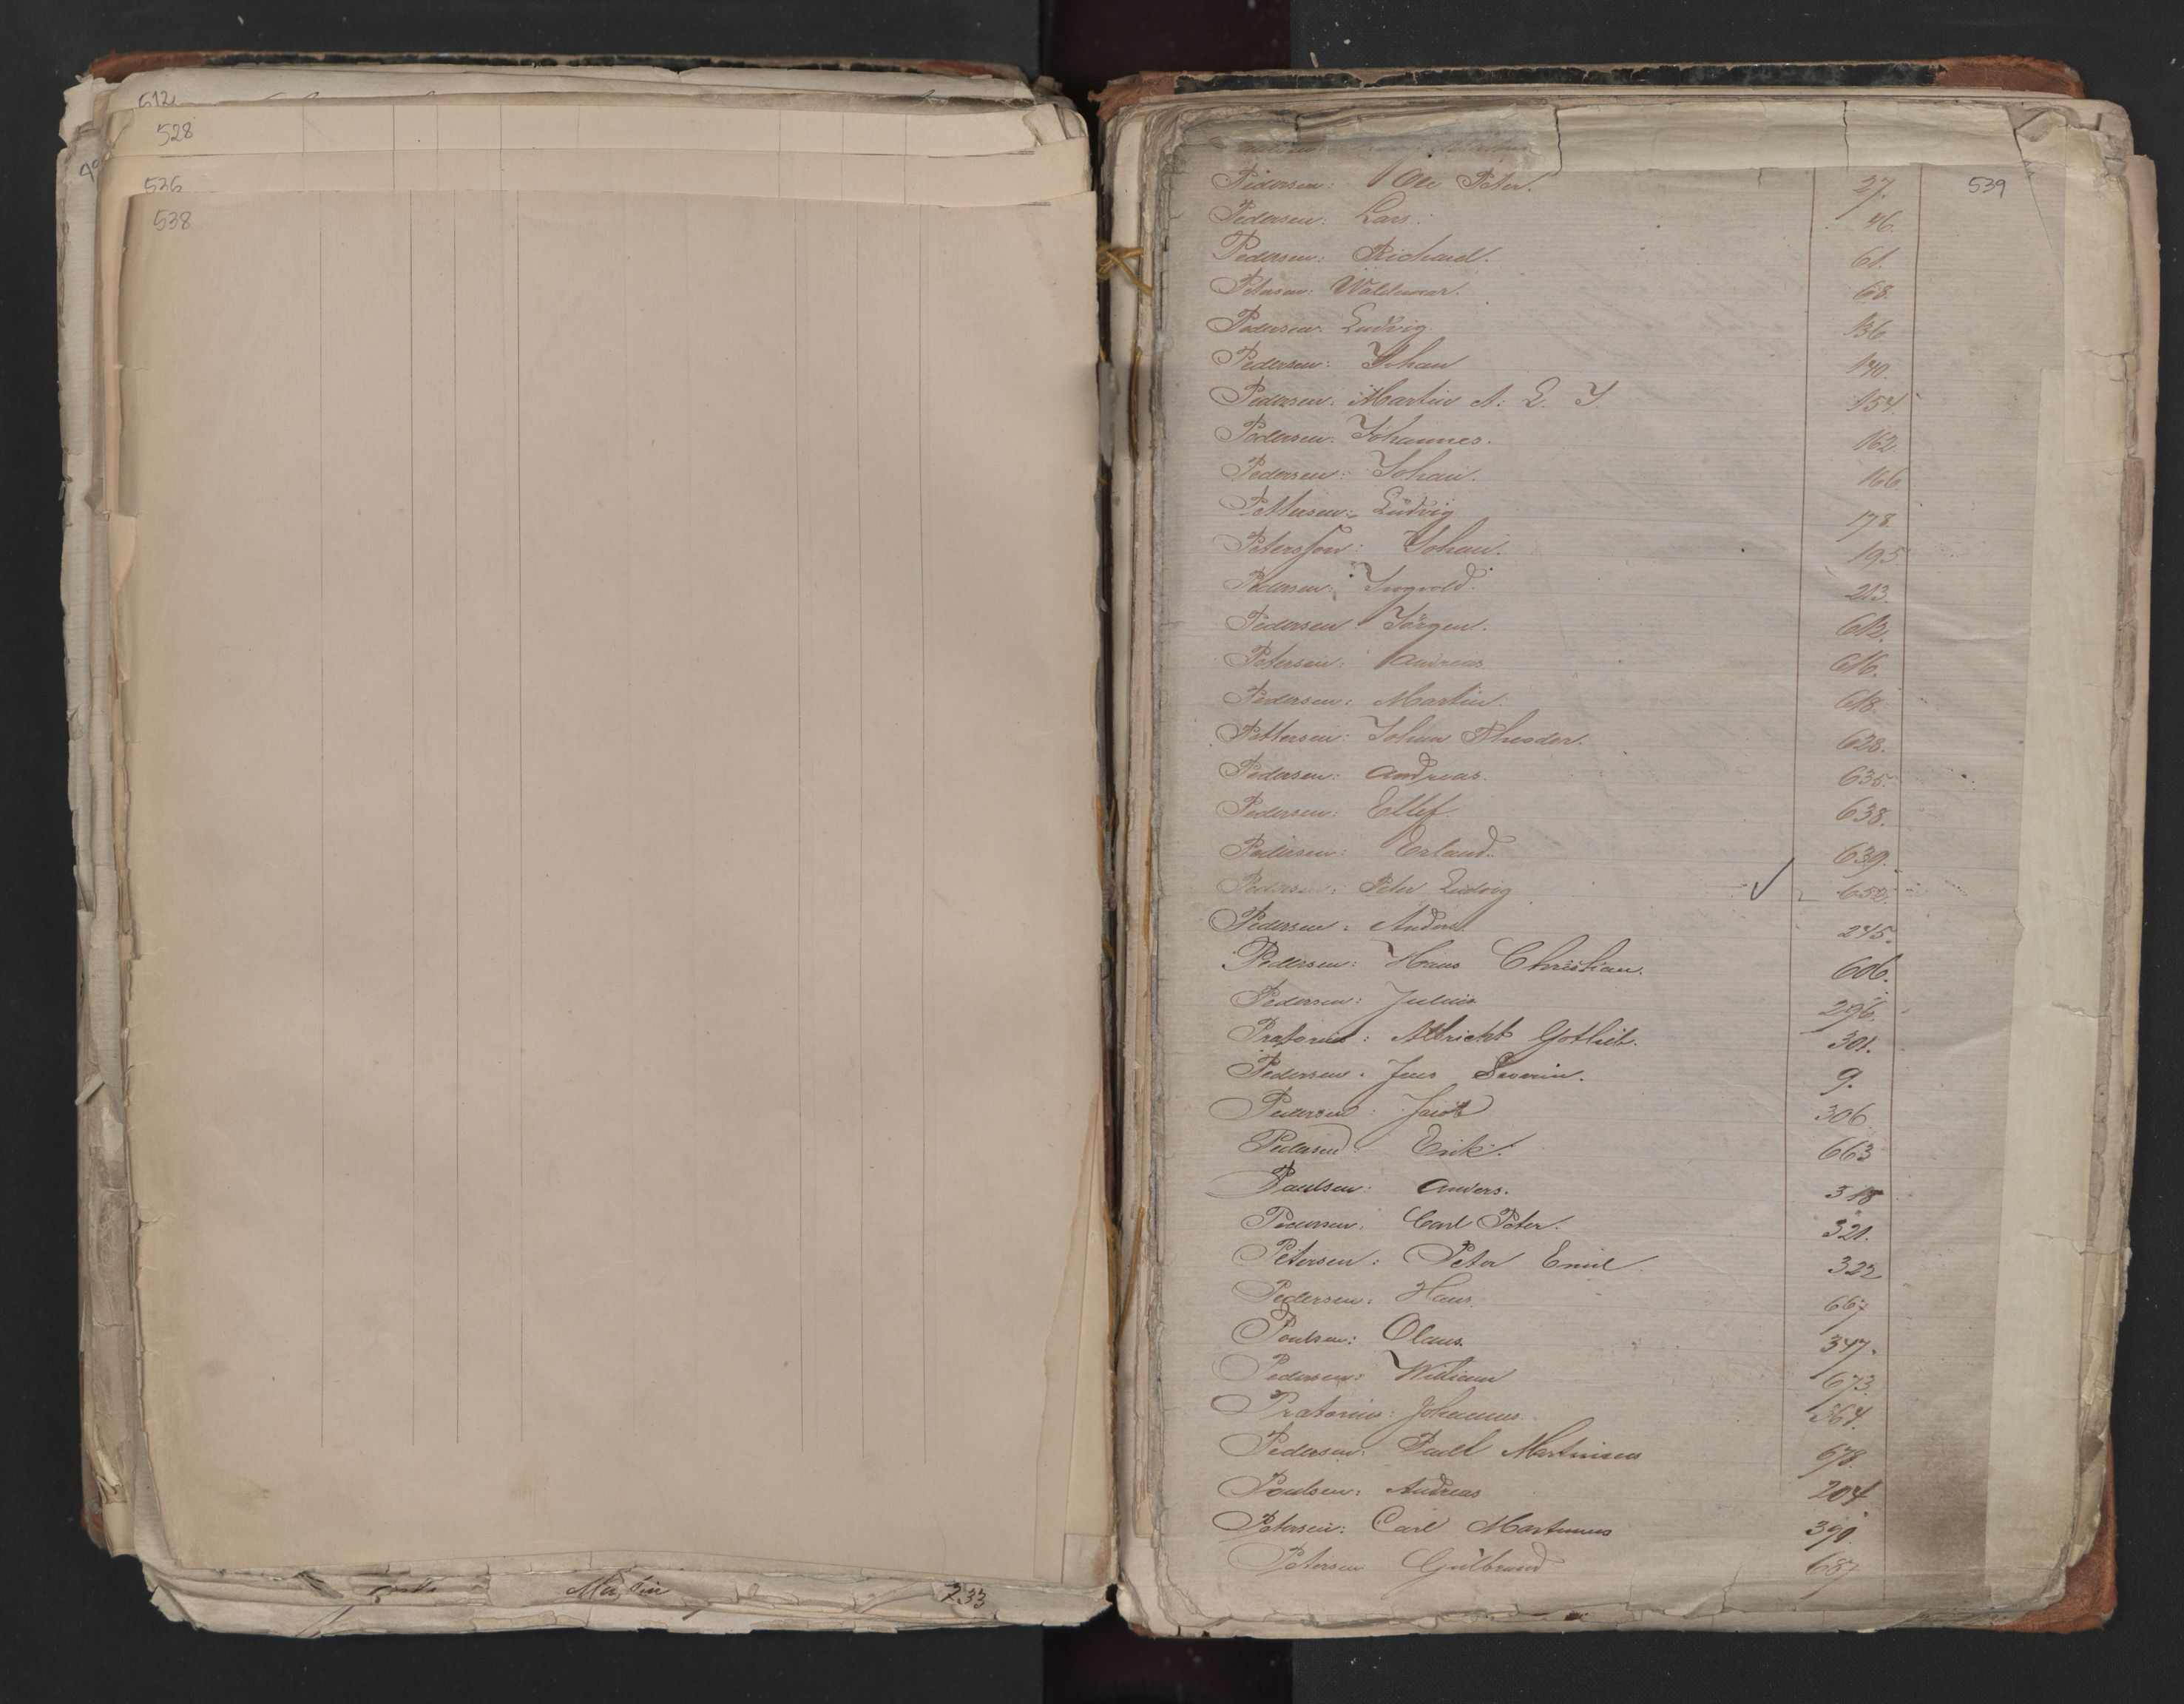 SAO, Oslo sjømannskontor, F/Fa/L0001: Register for Kristiania krets, 1866-1891, s. 538-539